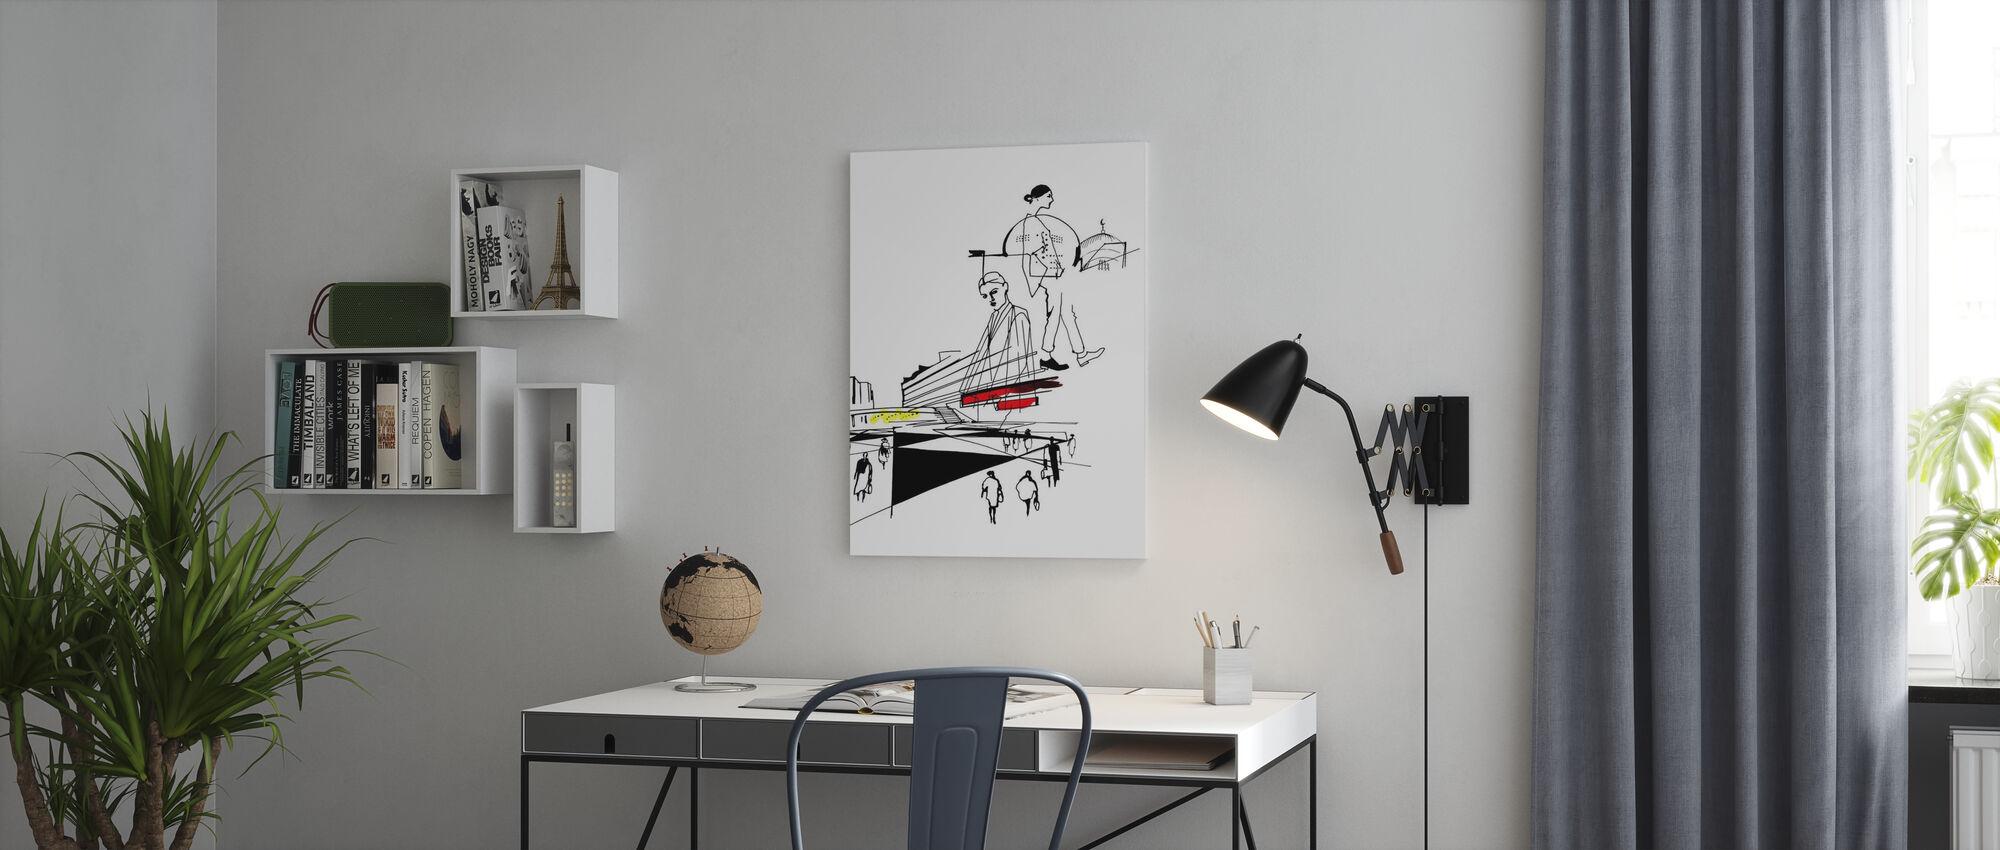 Stockholm - Sergels Torg - Canvas print - Office